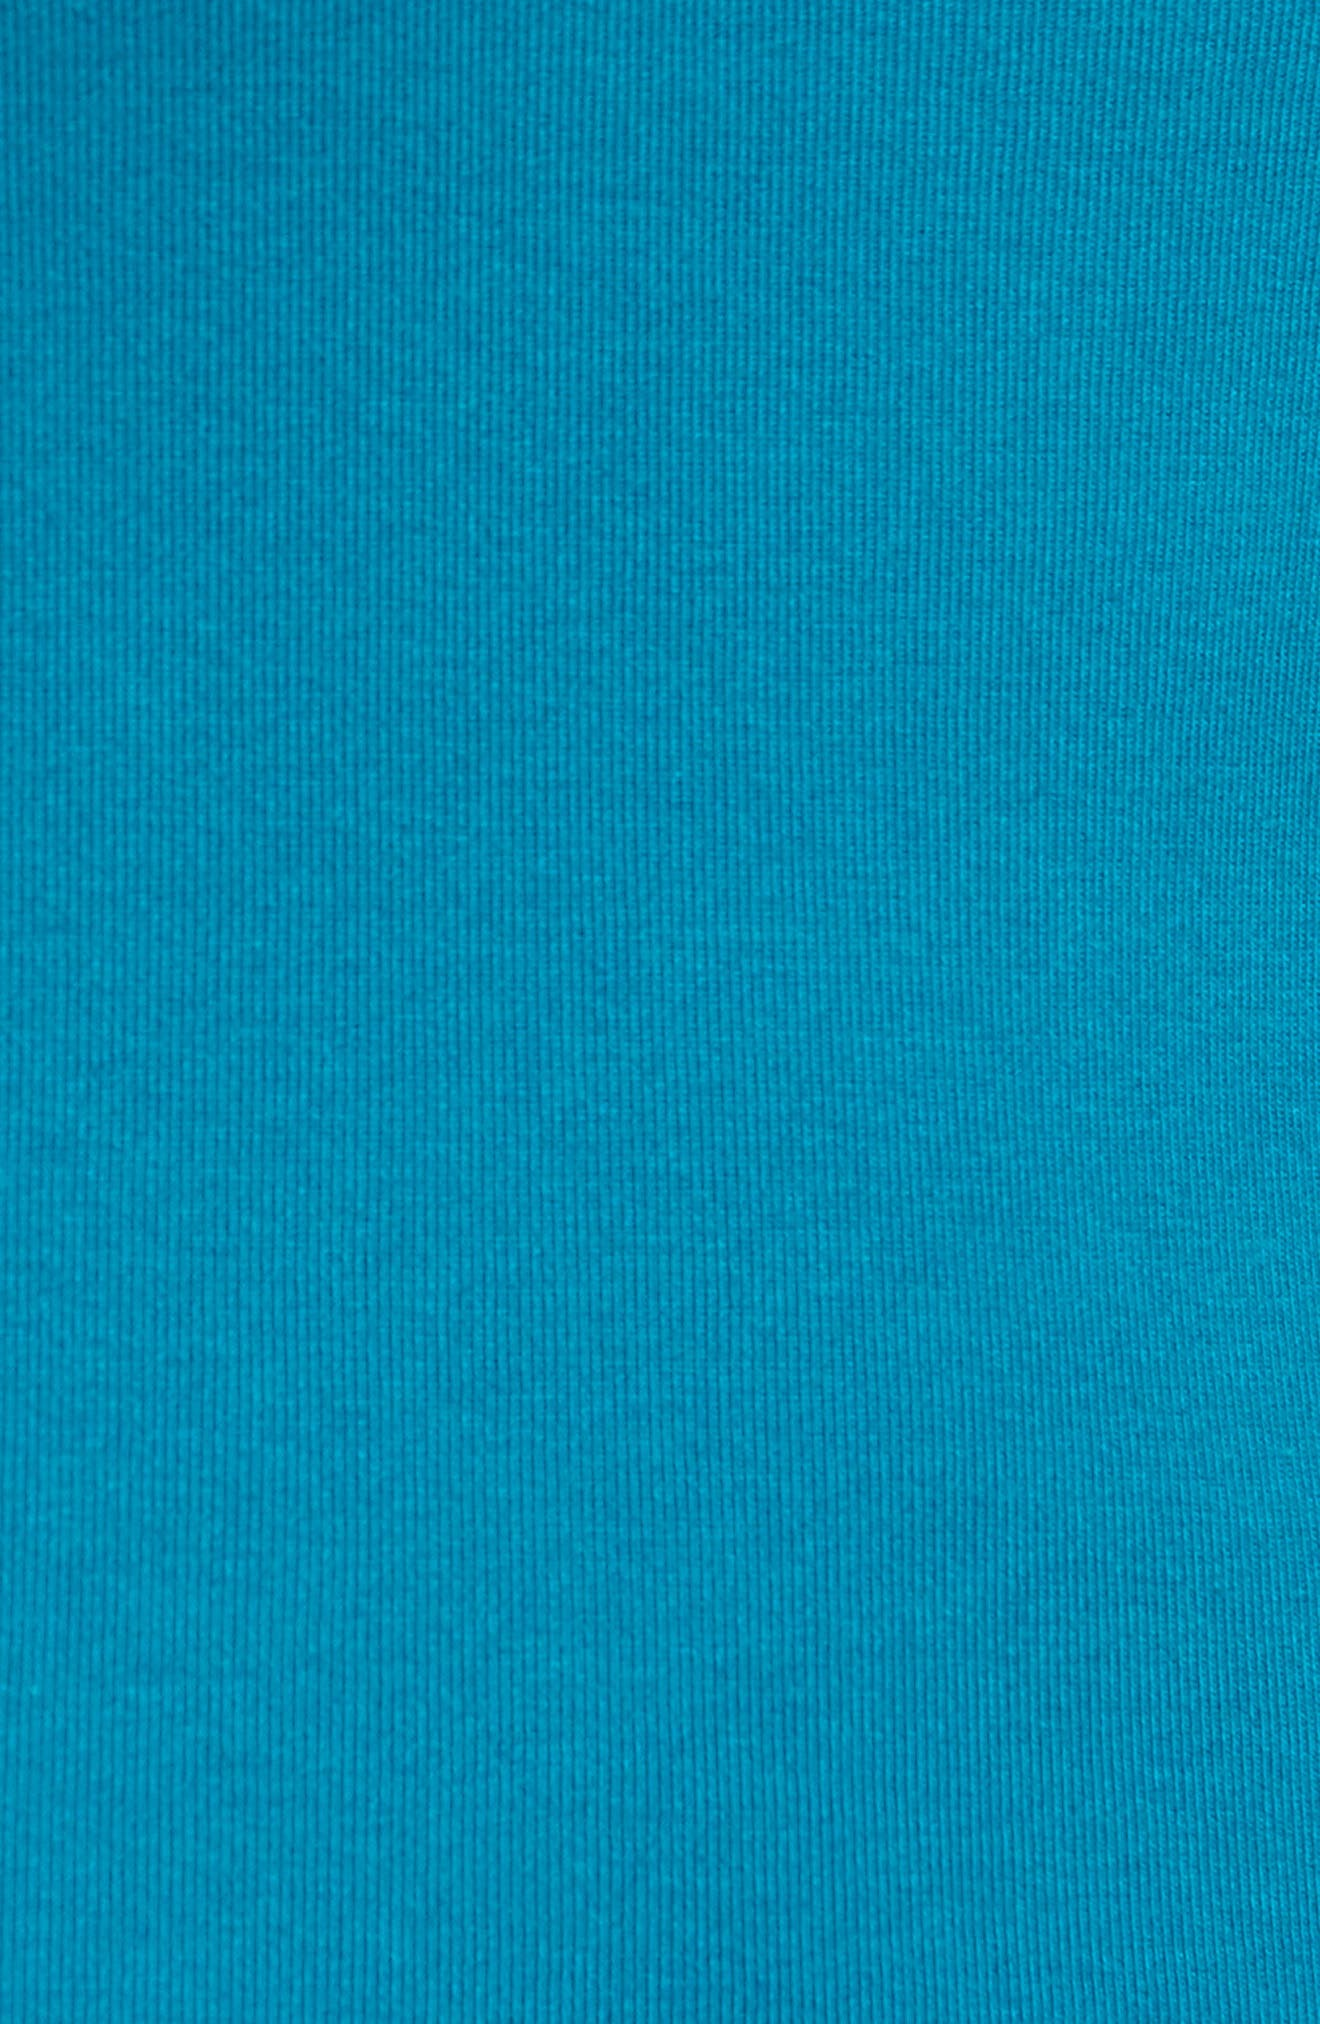 Ballet Neck Cotton & Modal Knit Elbow Sleeve Tee,                             Alternate thumbnail 249, color,